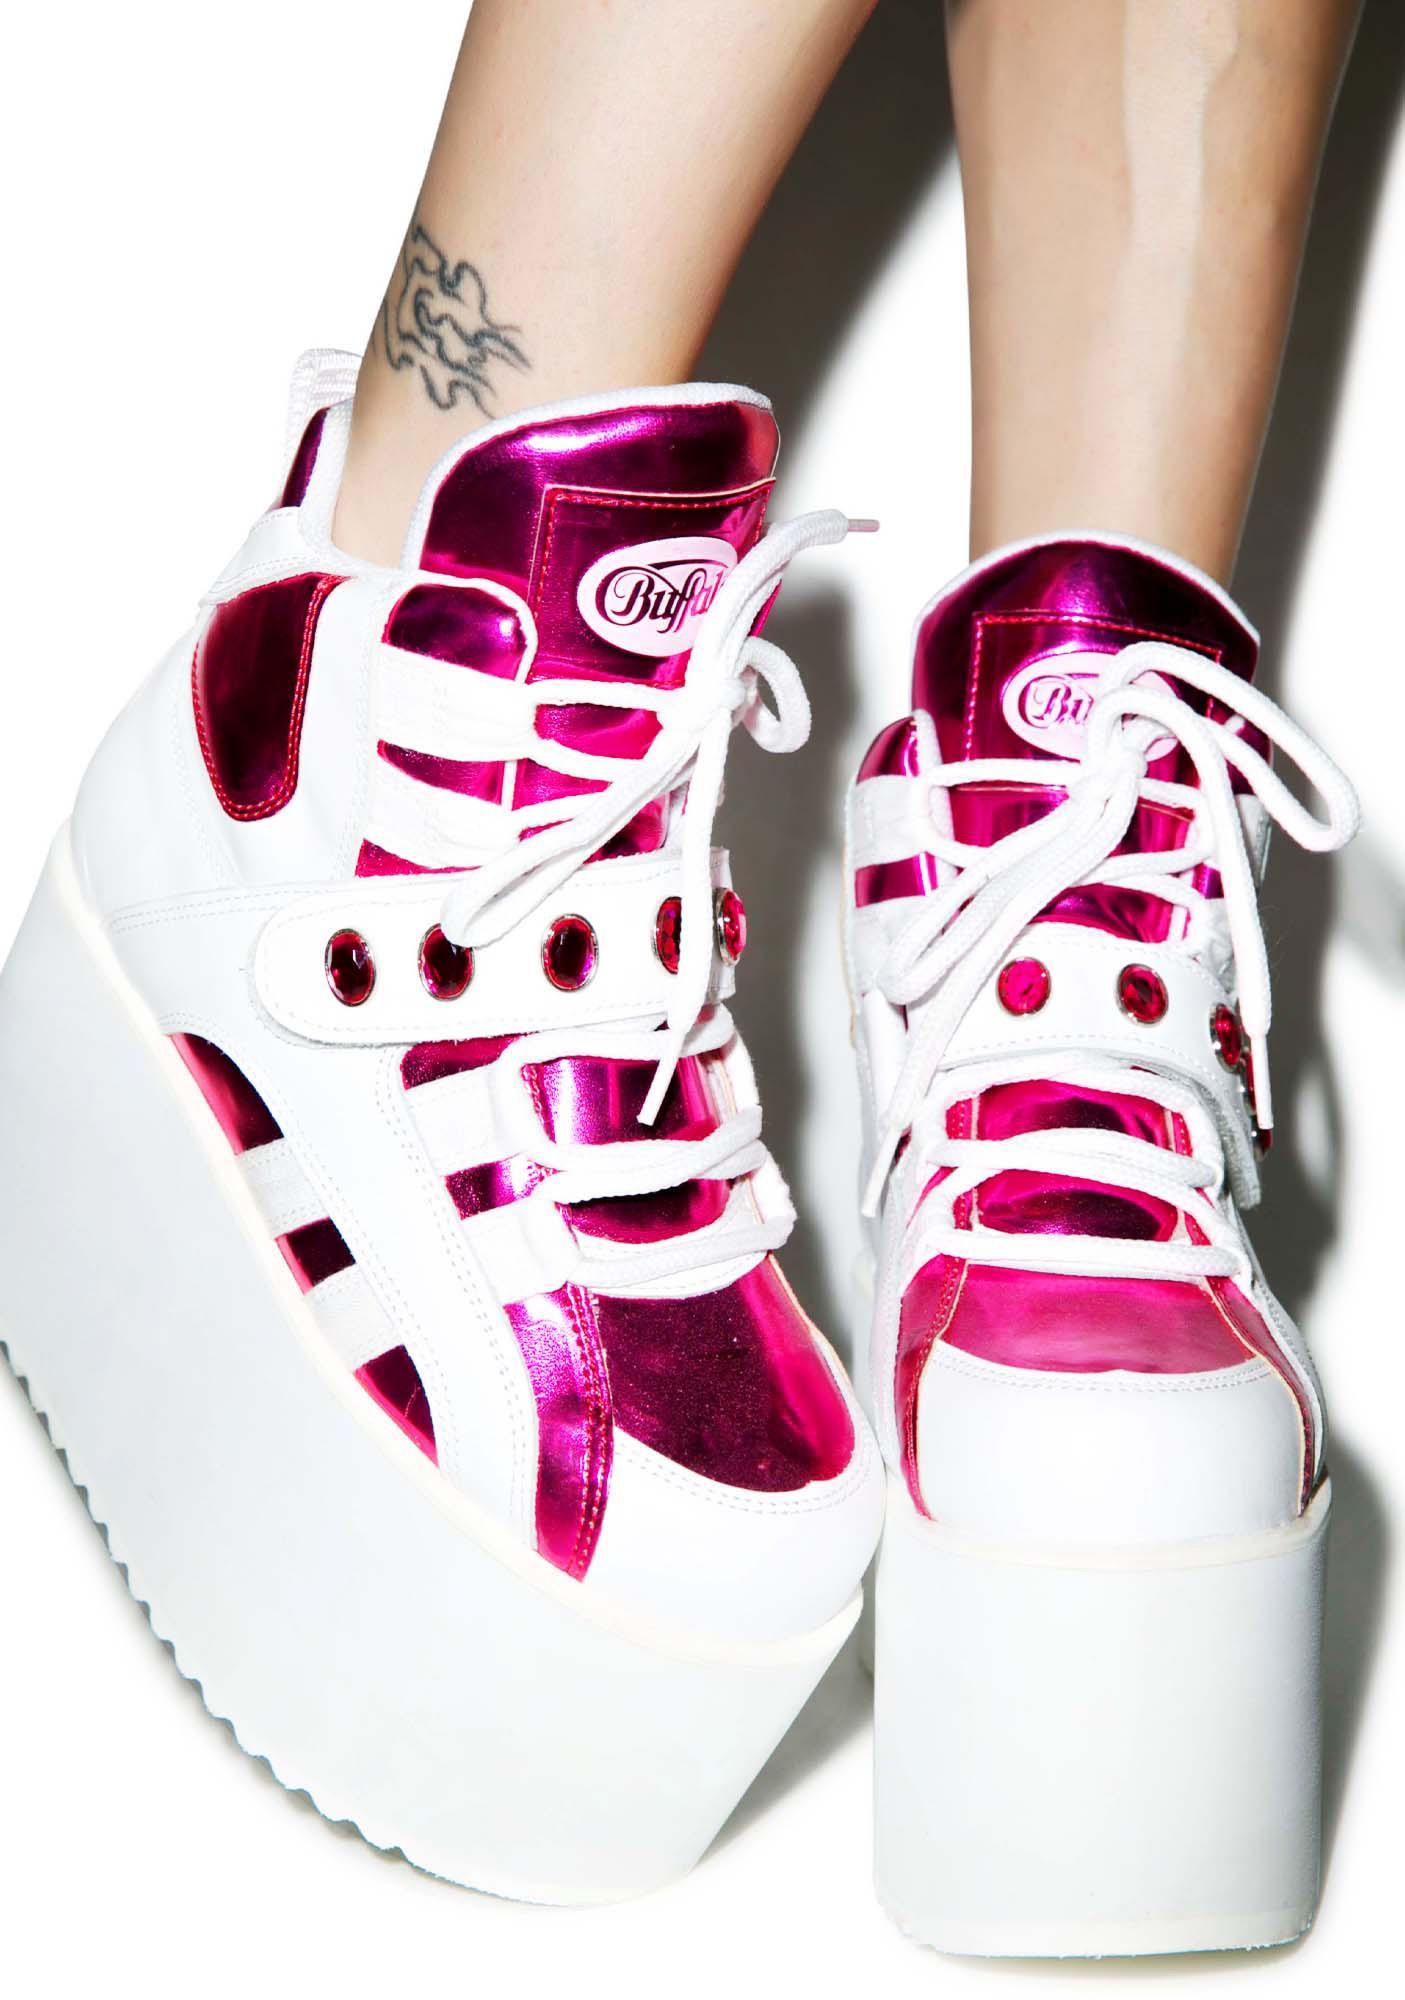 Buffalo London BB Spice Pink Platforms